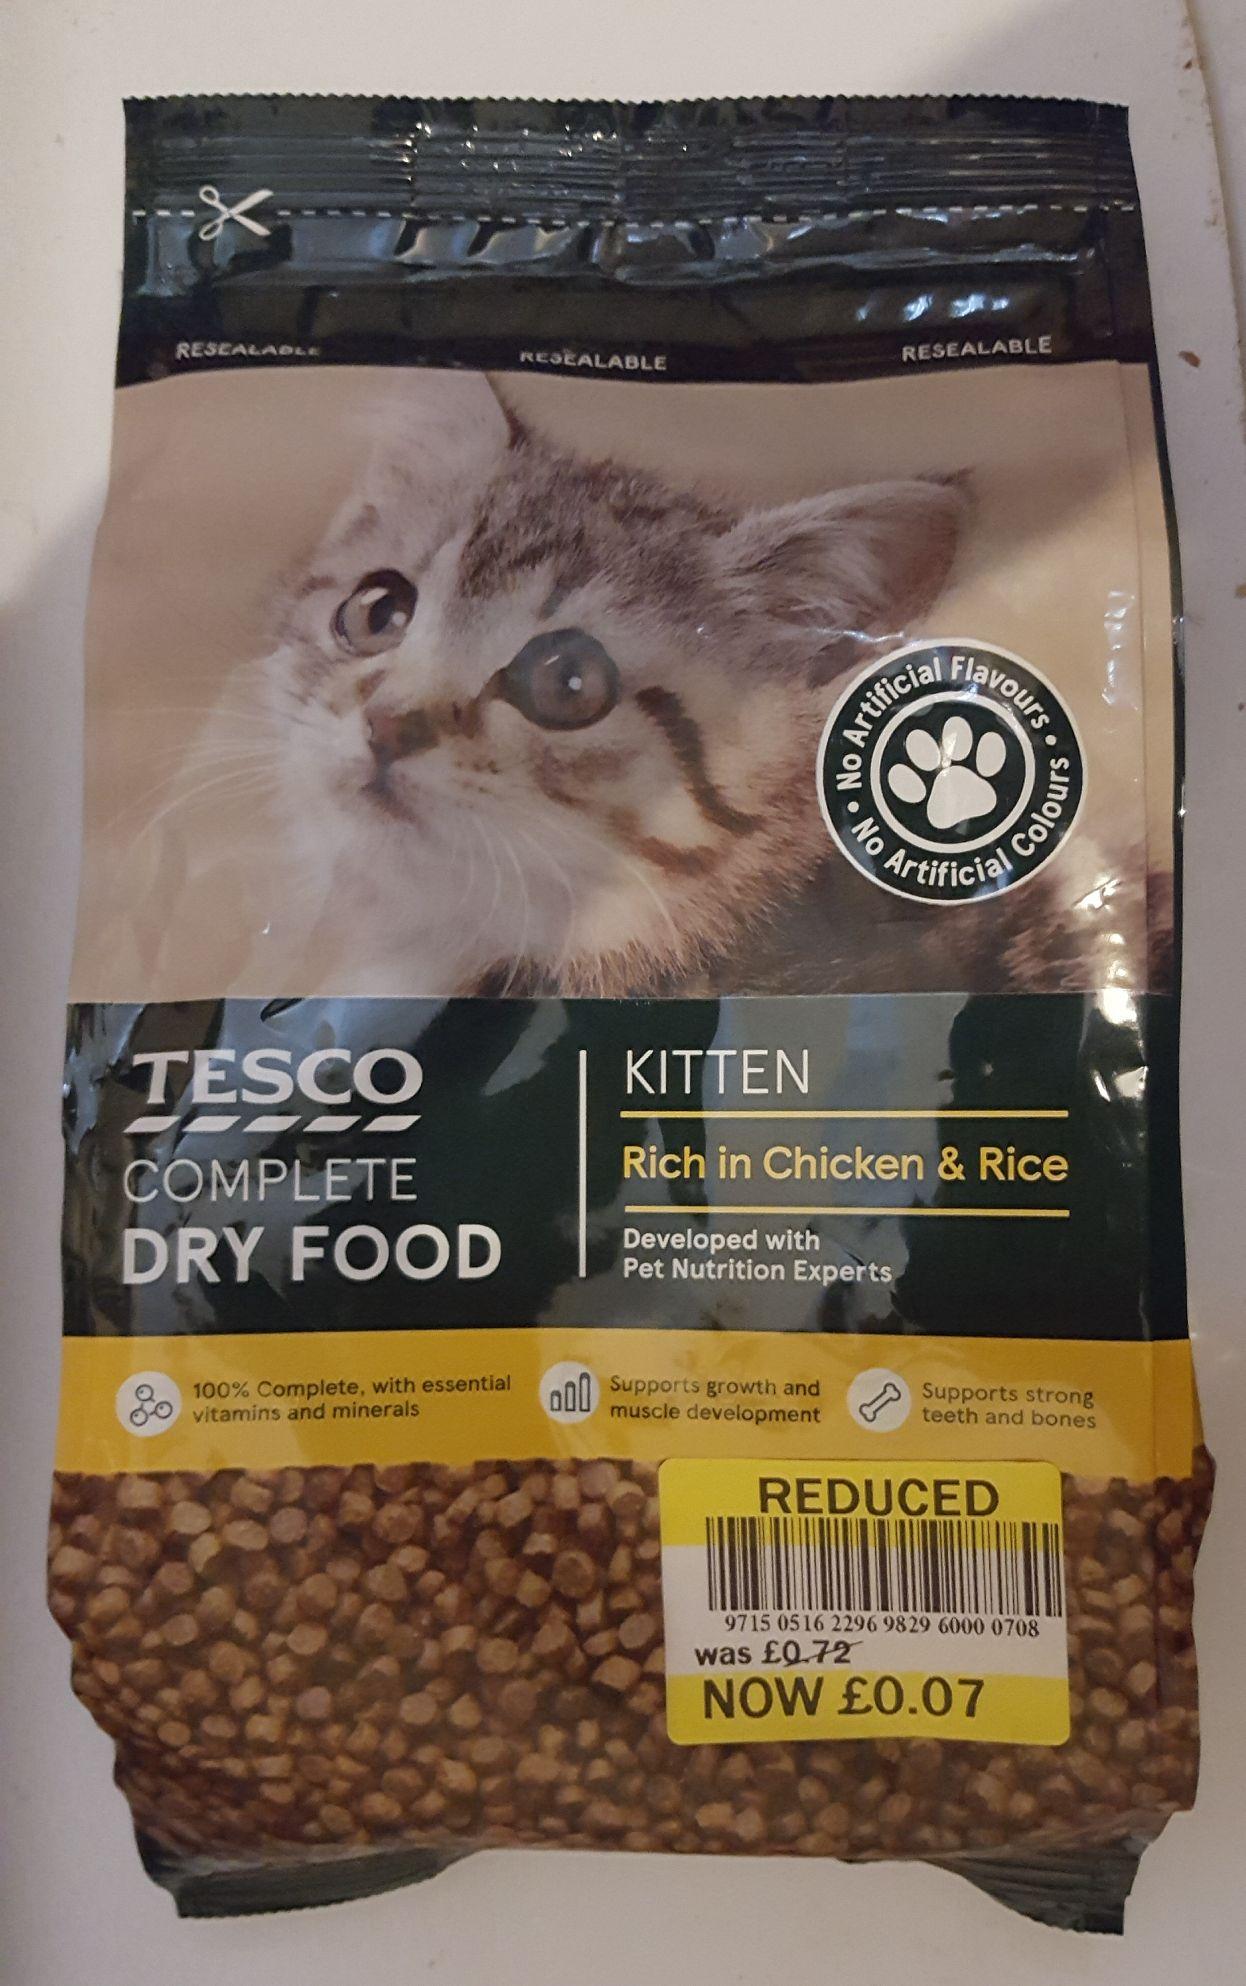 Tesco Complete Kitten Dry Food 7p instore - Clarkston